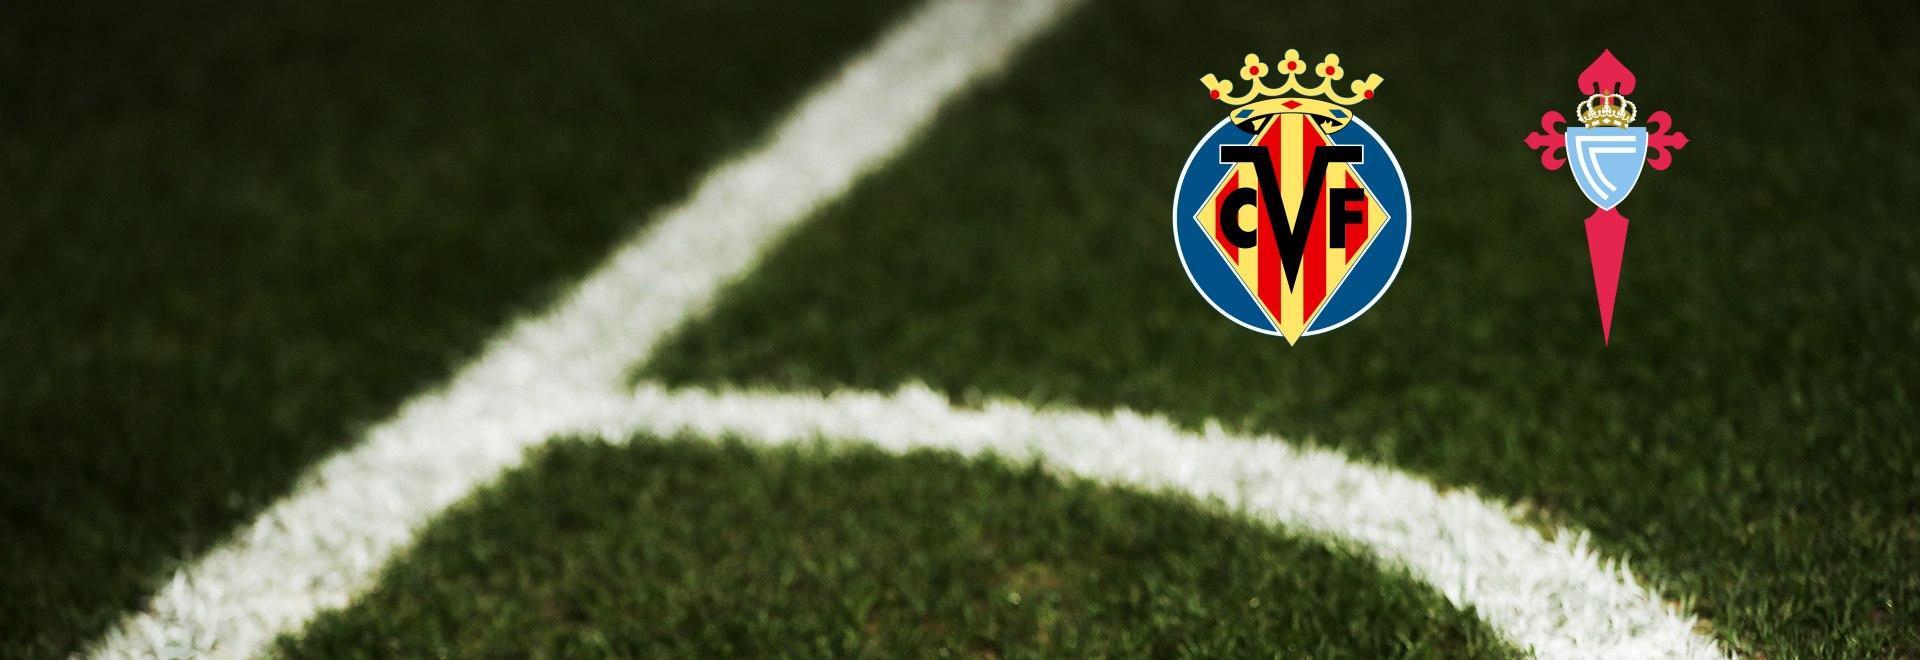 Villarreal - Celta Vigo. 35a g.